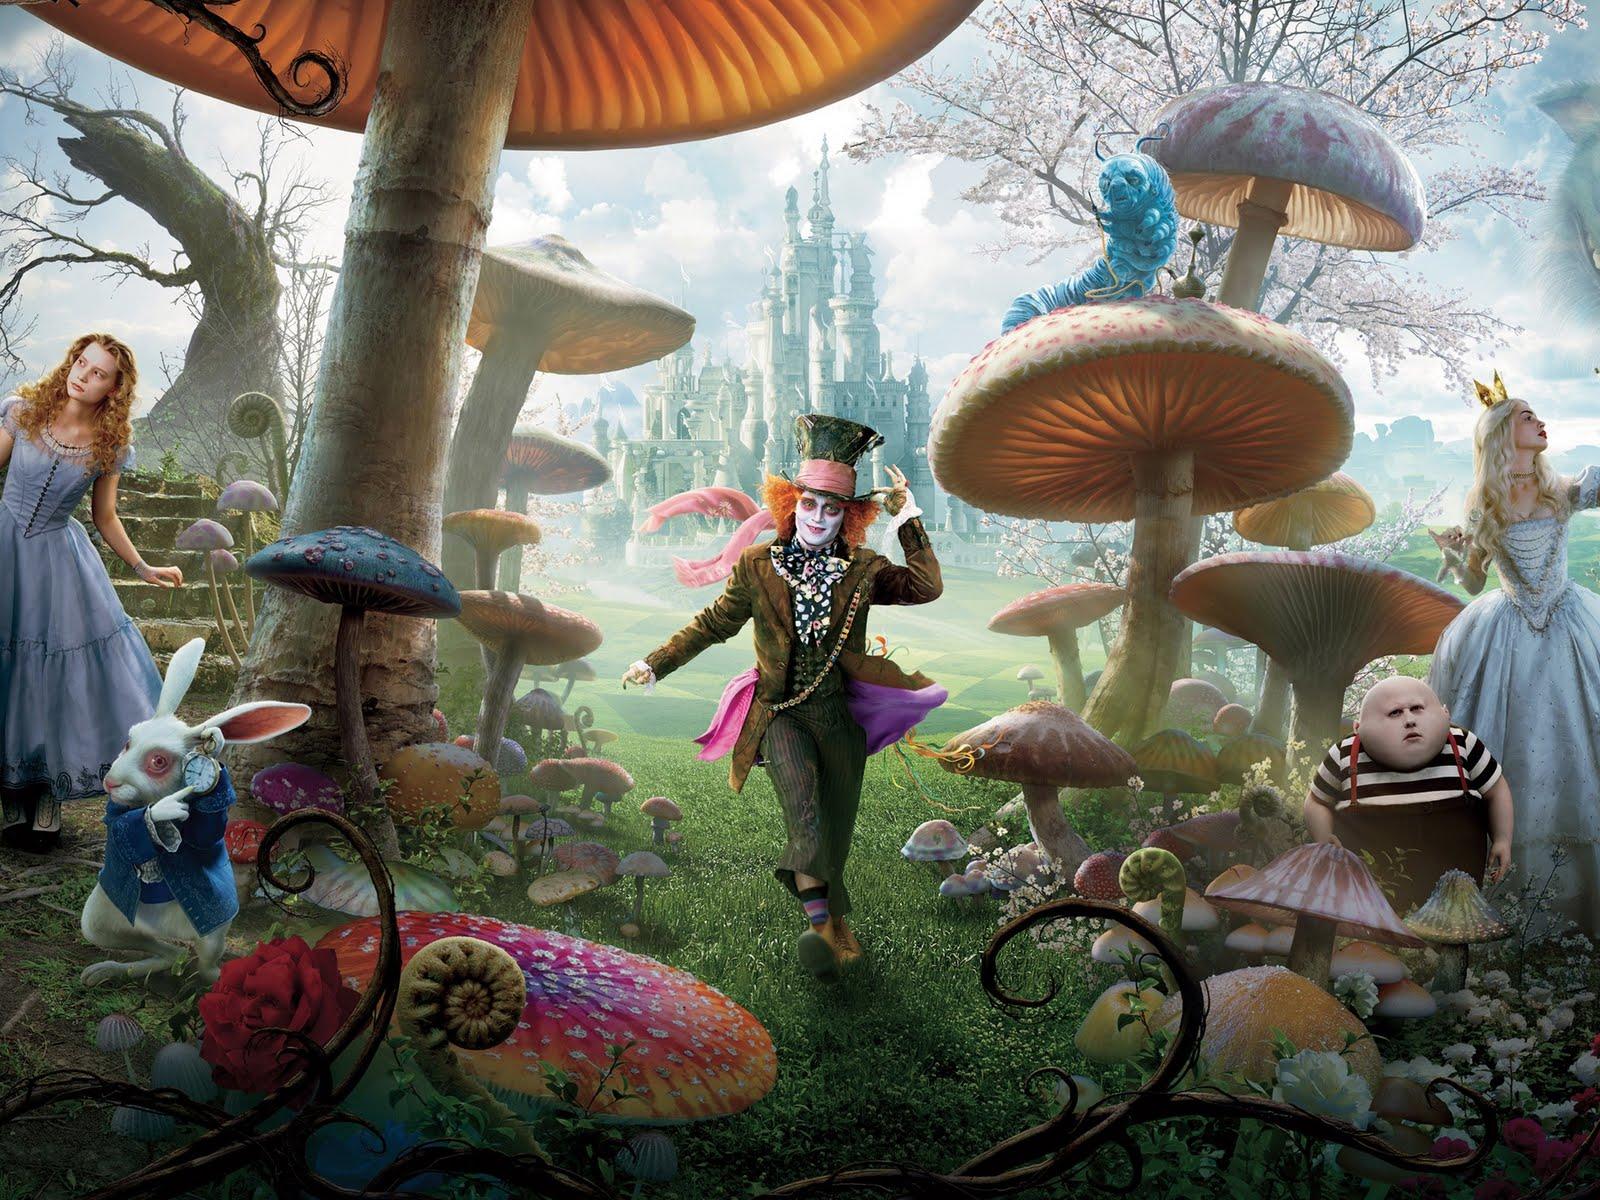 49+ Alice in Wonderland Caterpillar Wallpaper on WallpaperSa